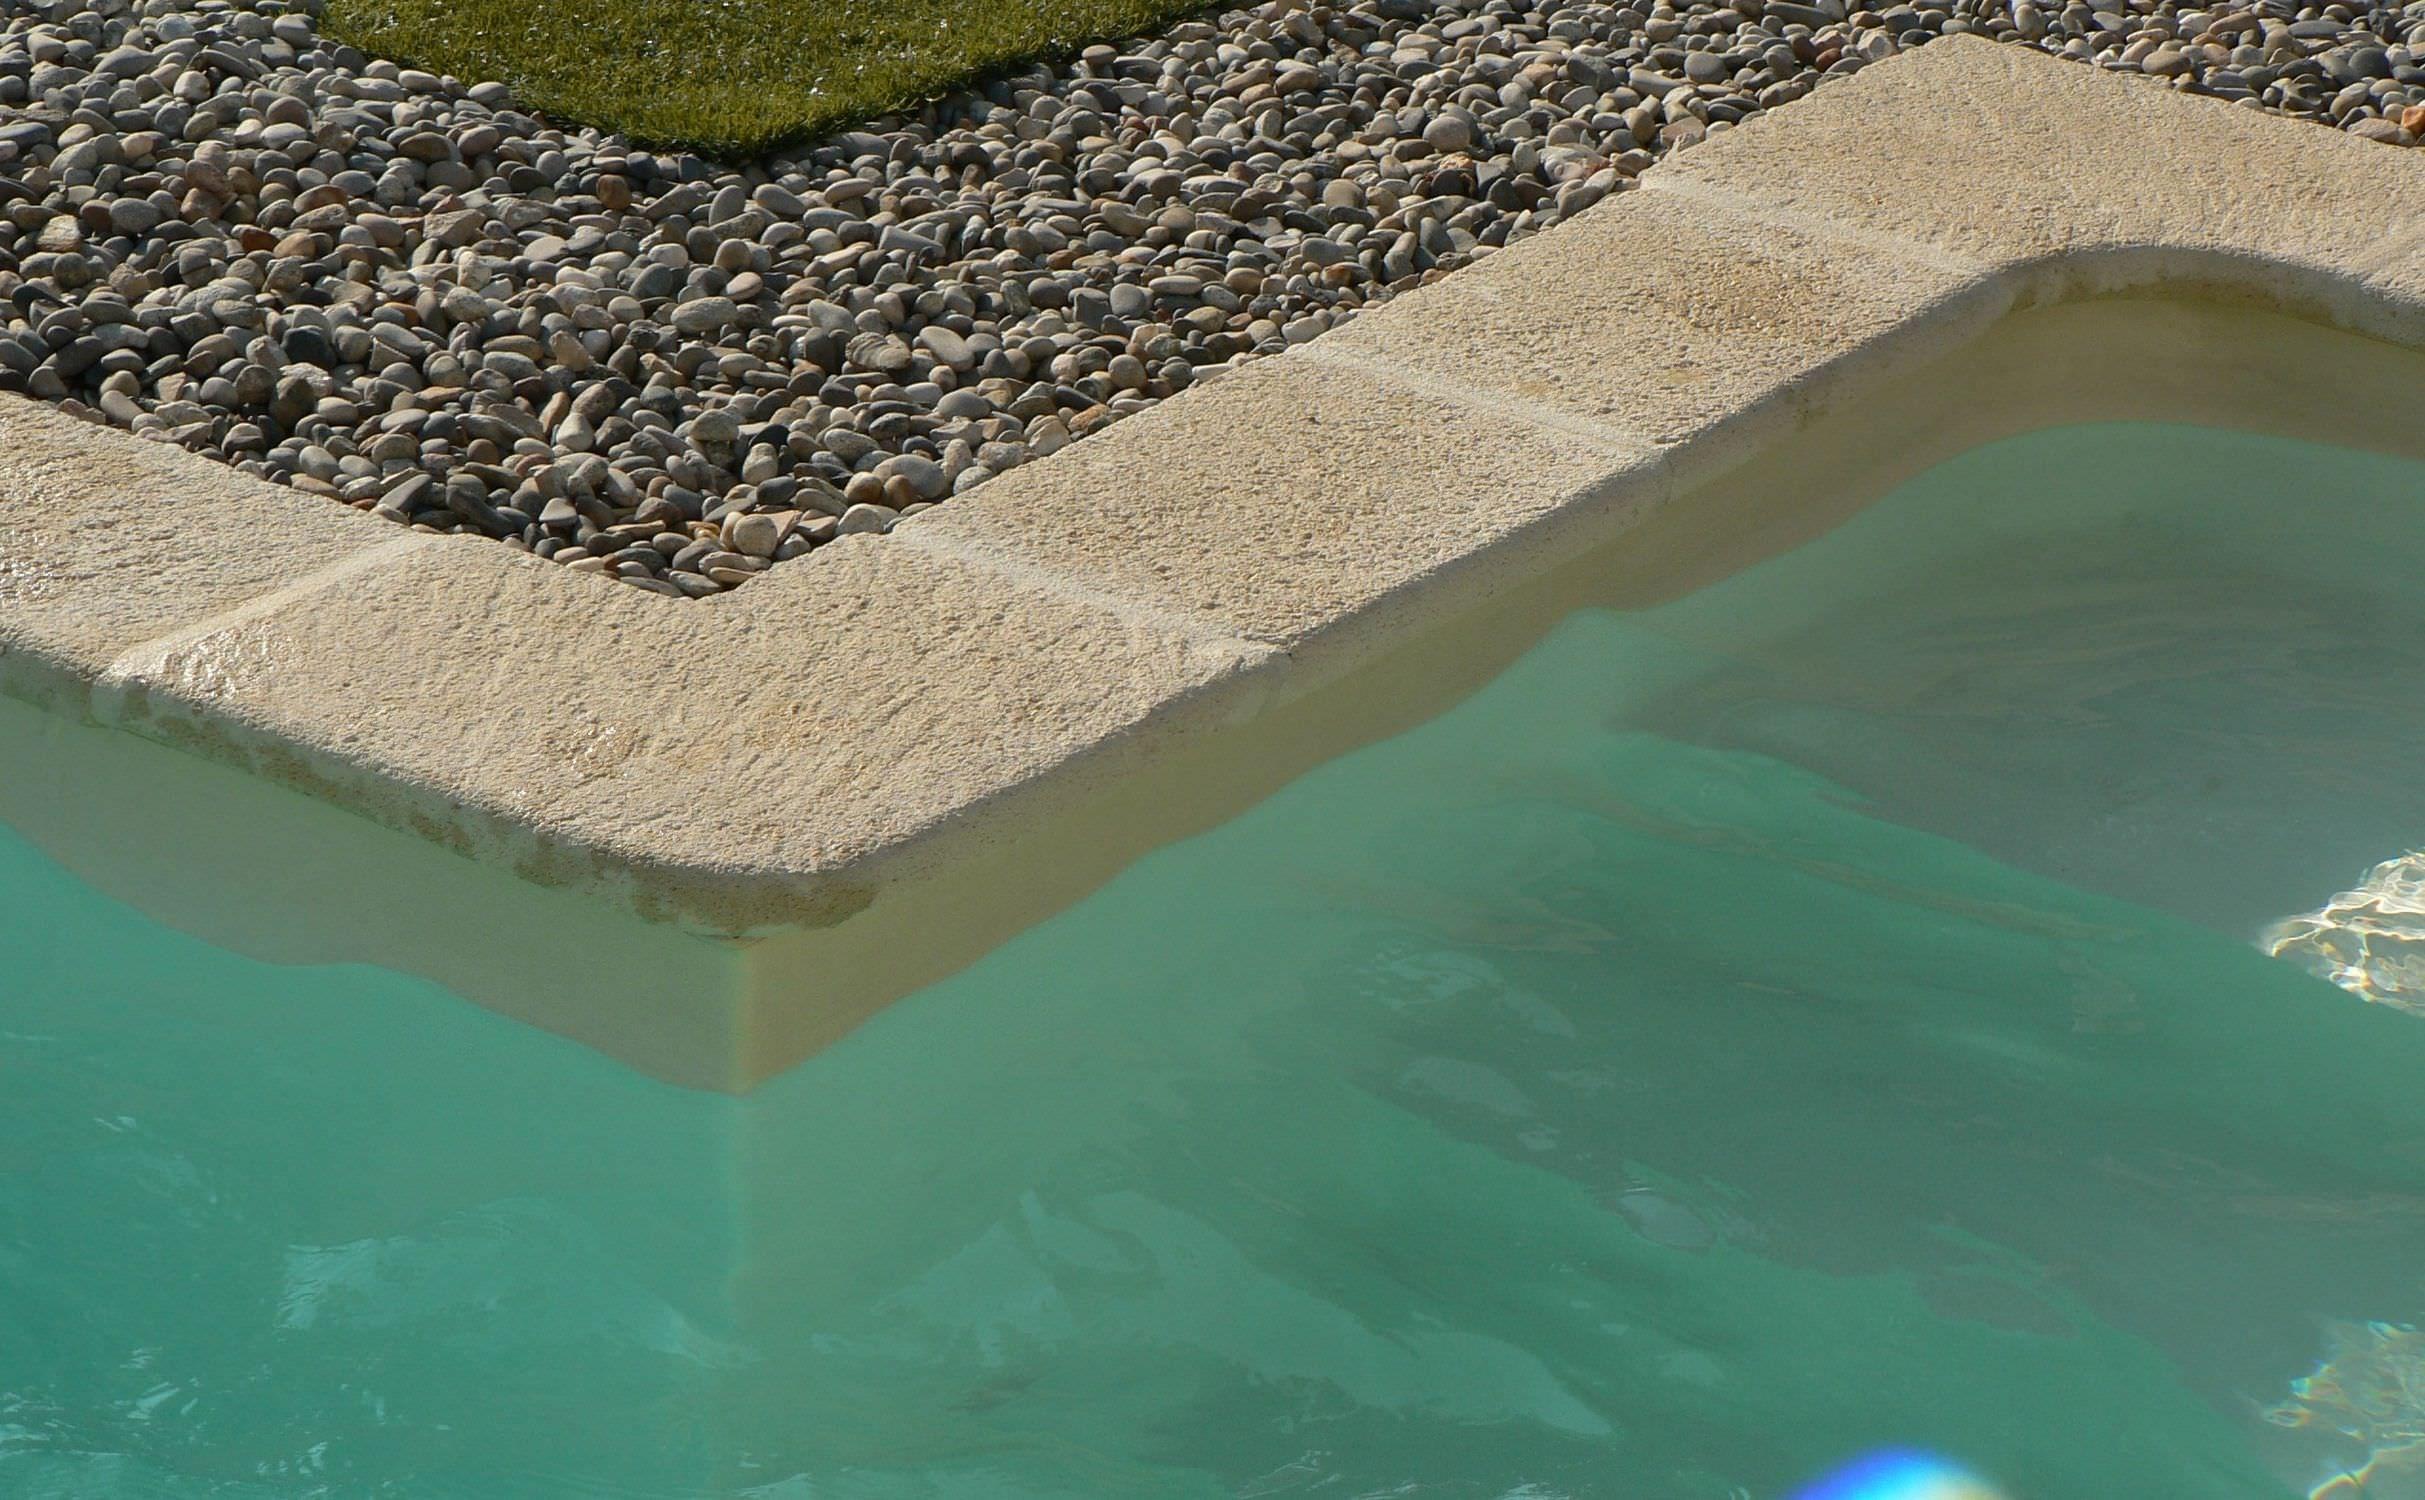 Borde de piscina de piedra reconstituida SERMI3 ROUVIERE Piscines